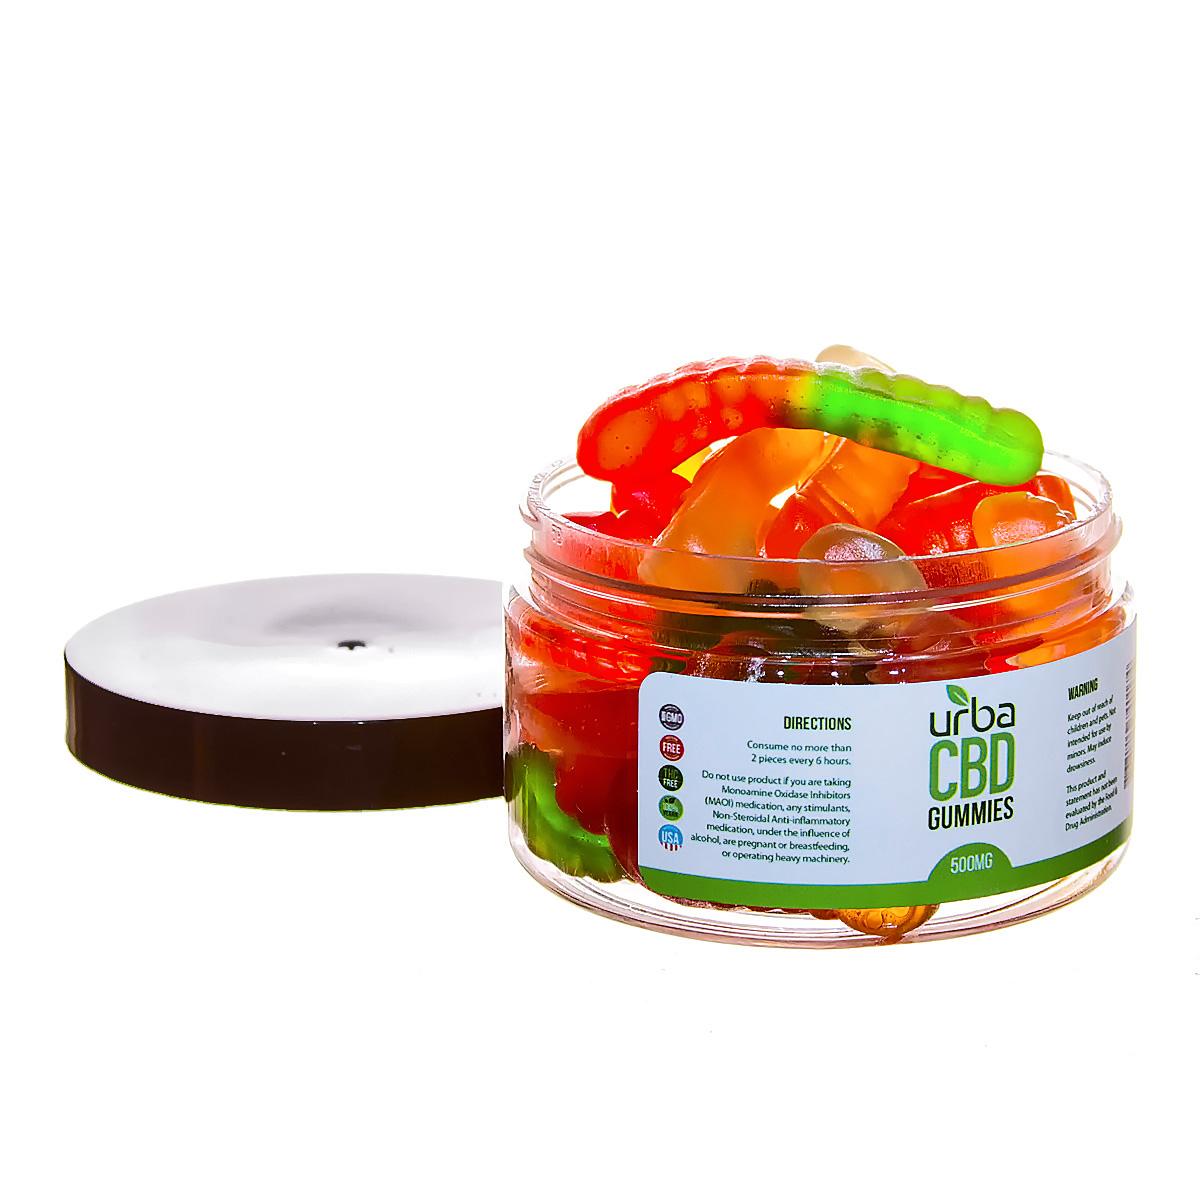 Urba CBD Gummies Worms 500mg